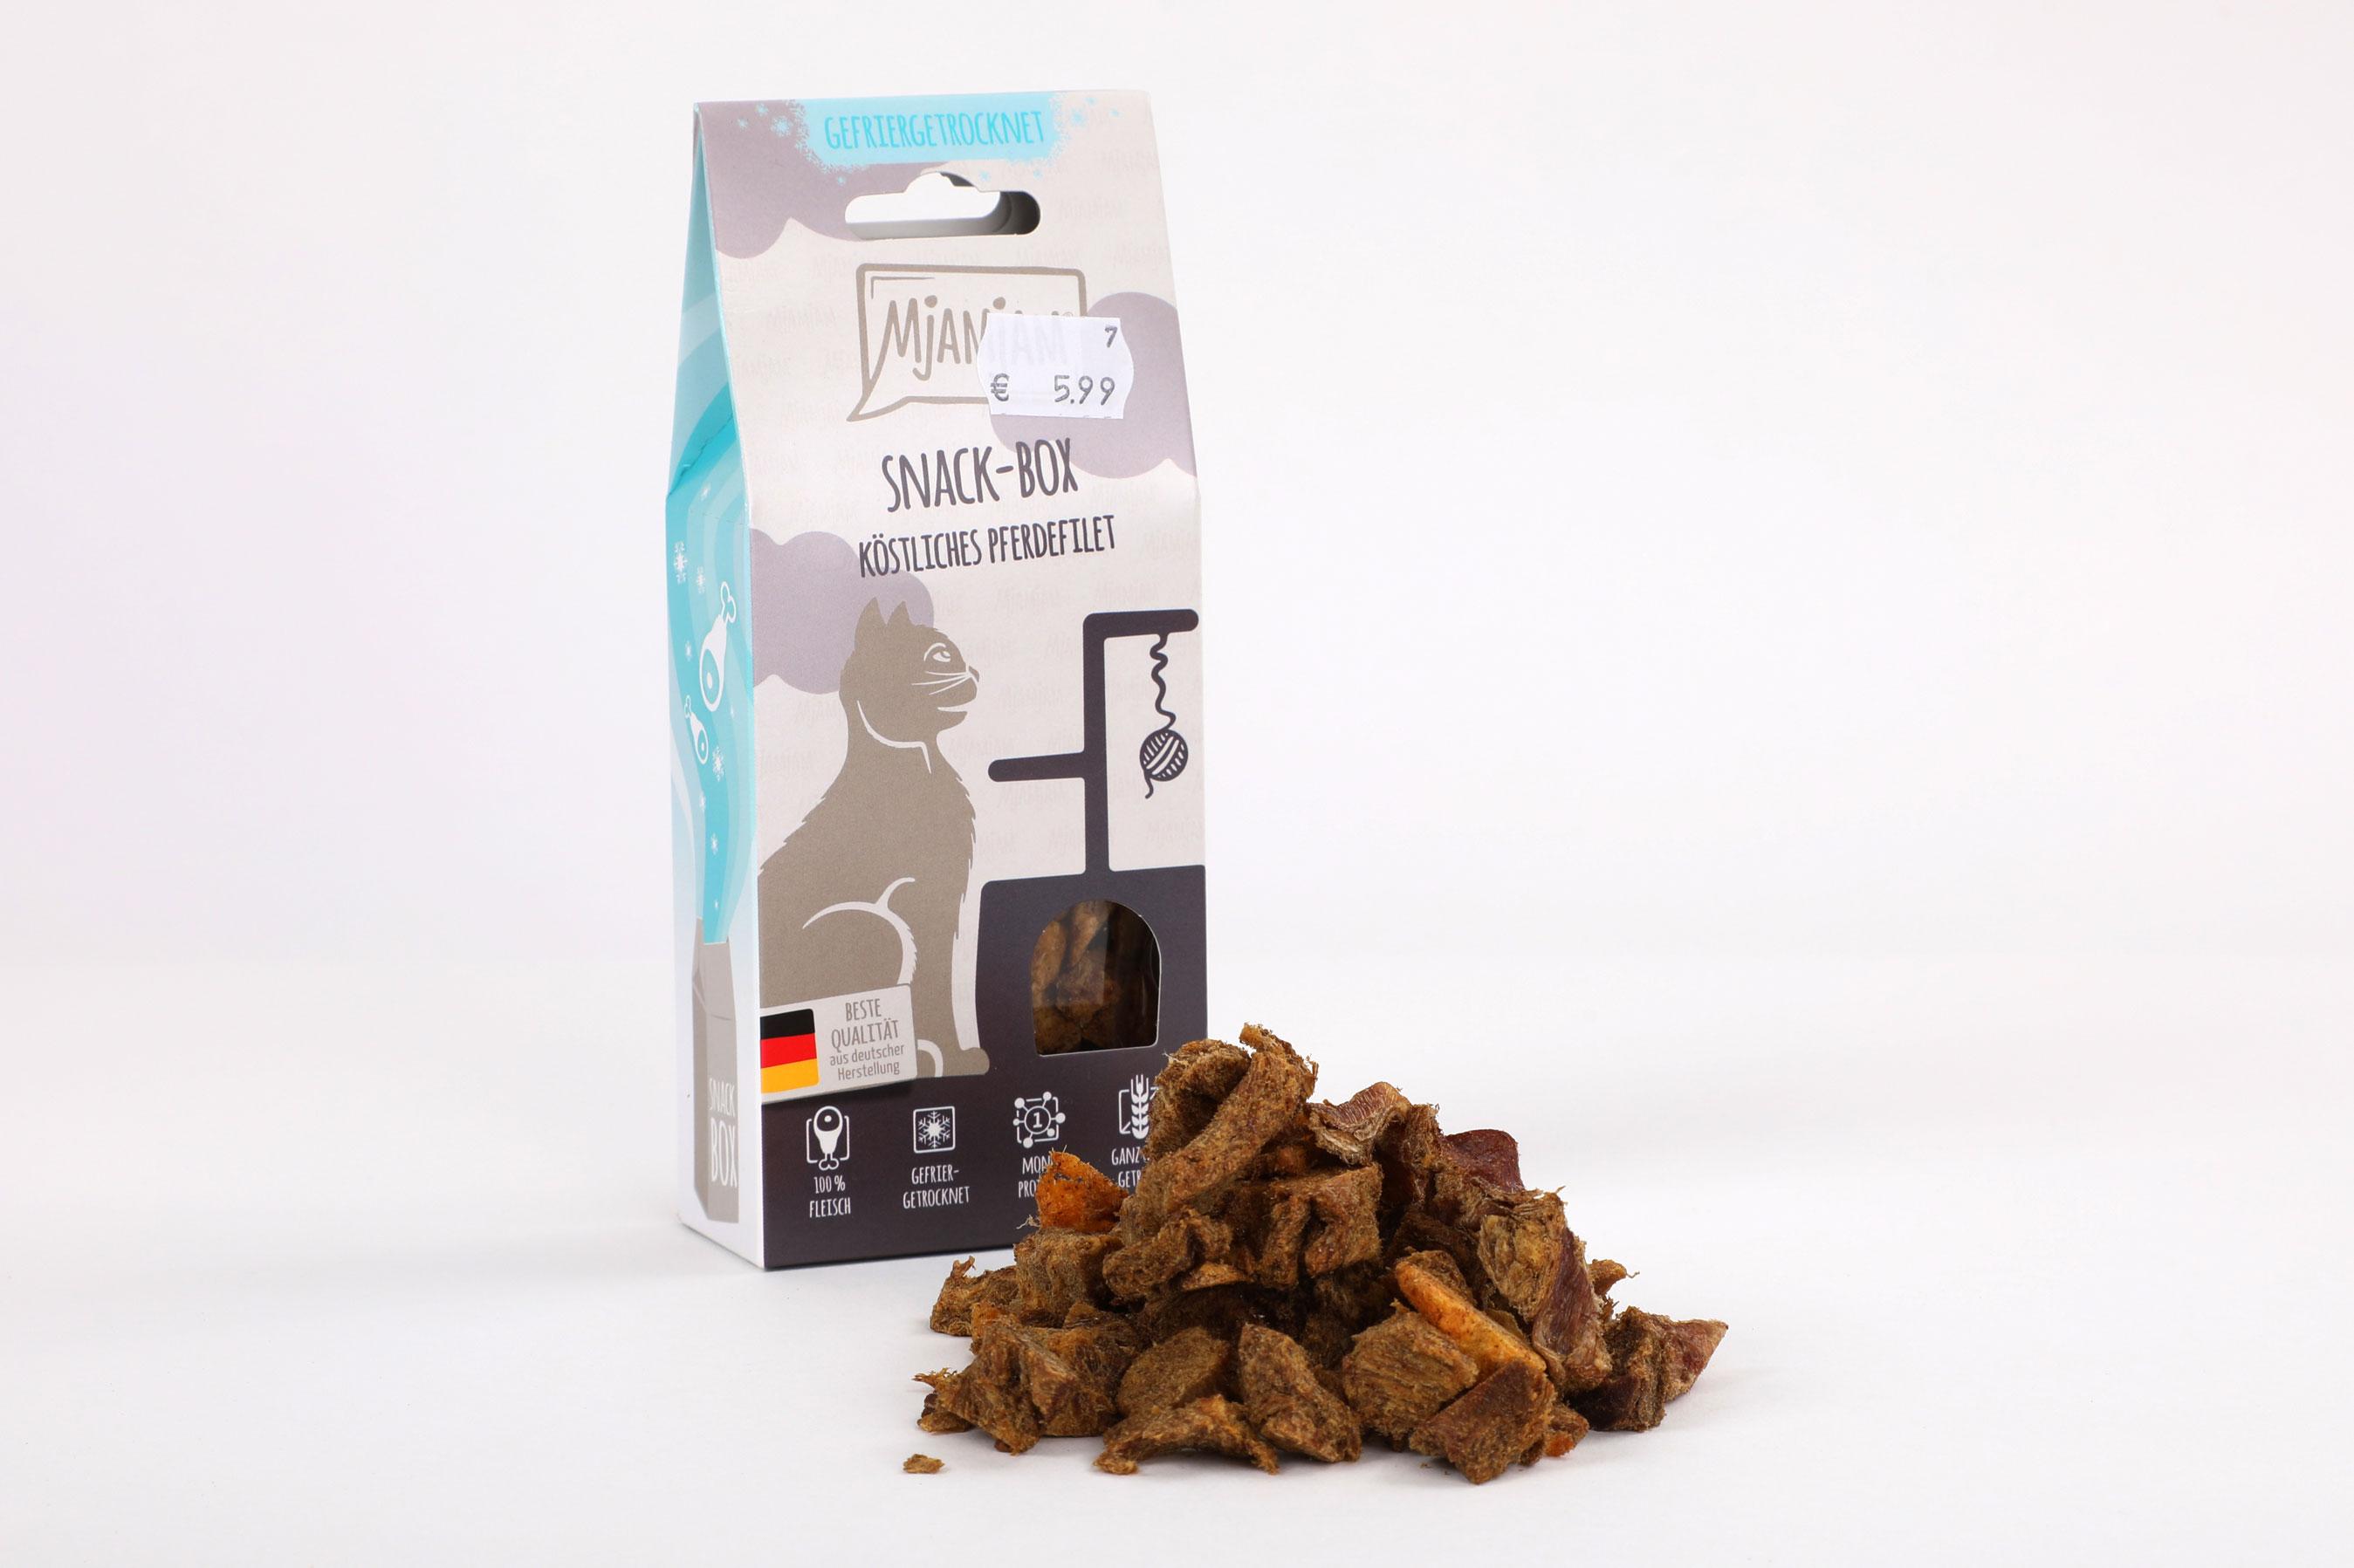 Mjamjam Snack-Box Pferd Napf Express Hundefutter Leckerlies Katzenfutter Katzenfutter online kaufen